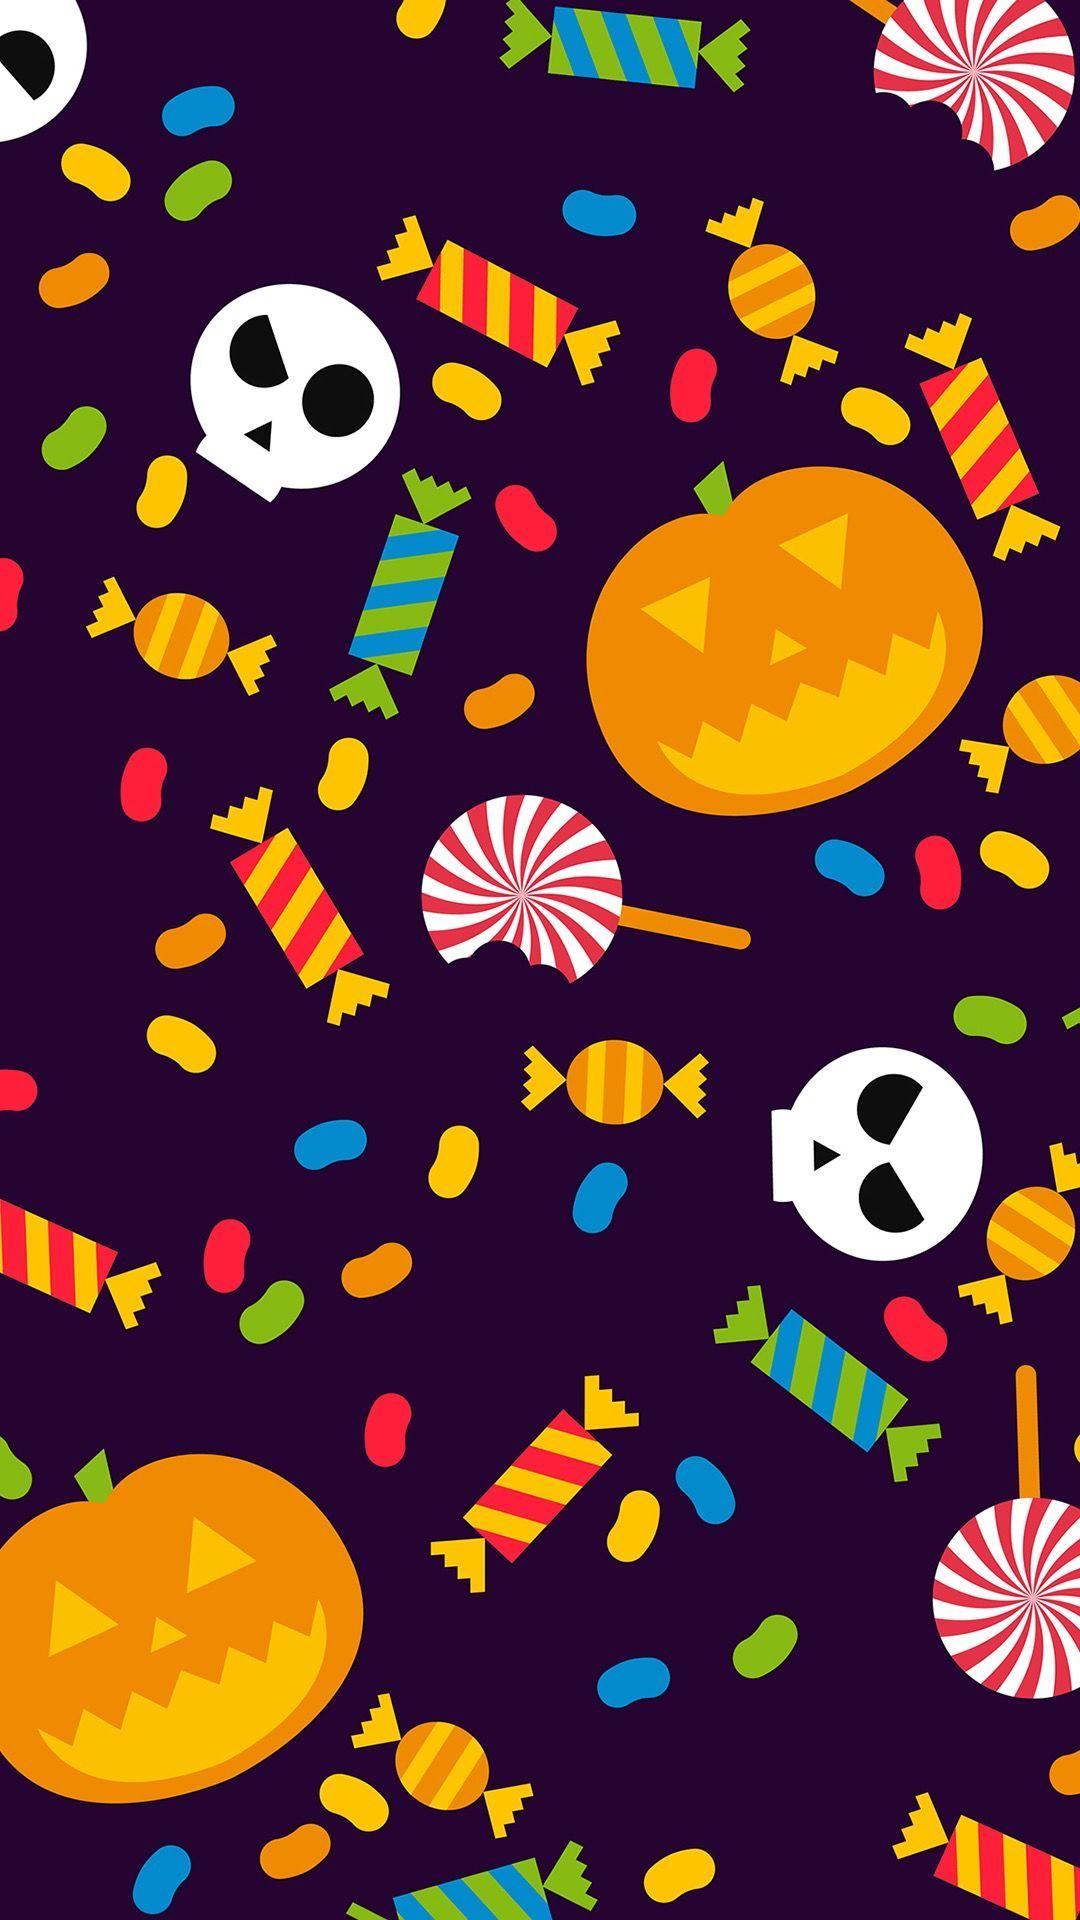 Halloween Candy Tap To See More Cute Haloween Iphone Image Wallpapers Mobile9 Kawaiihalloween Cu Android Wallpaper Iphone Wallpaper Halloween Backgrounds